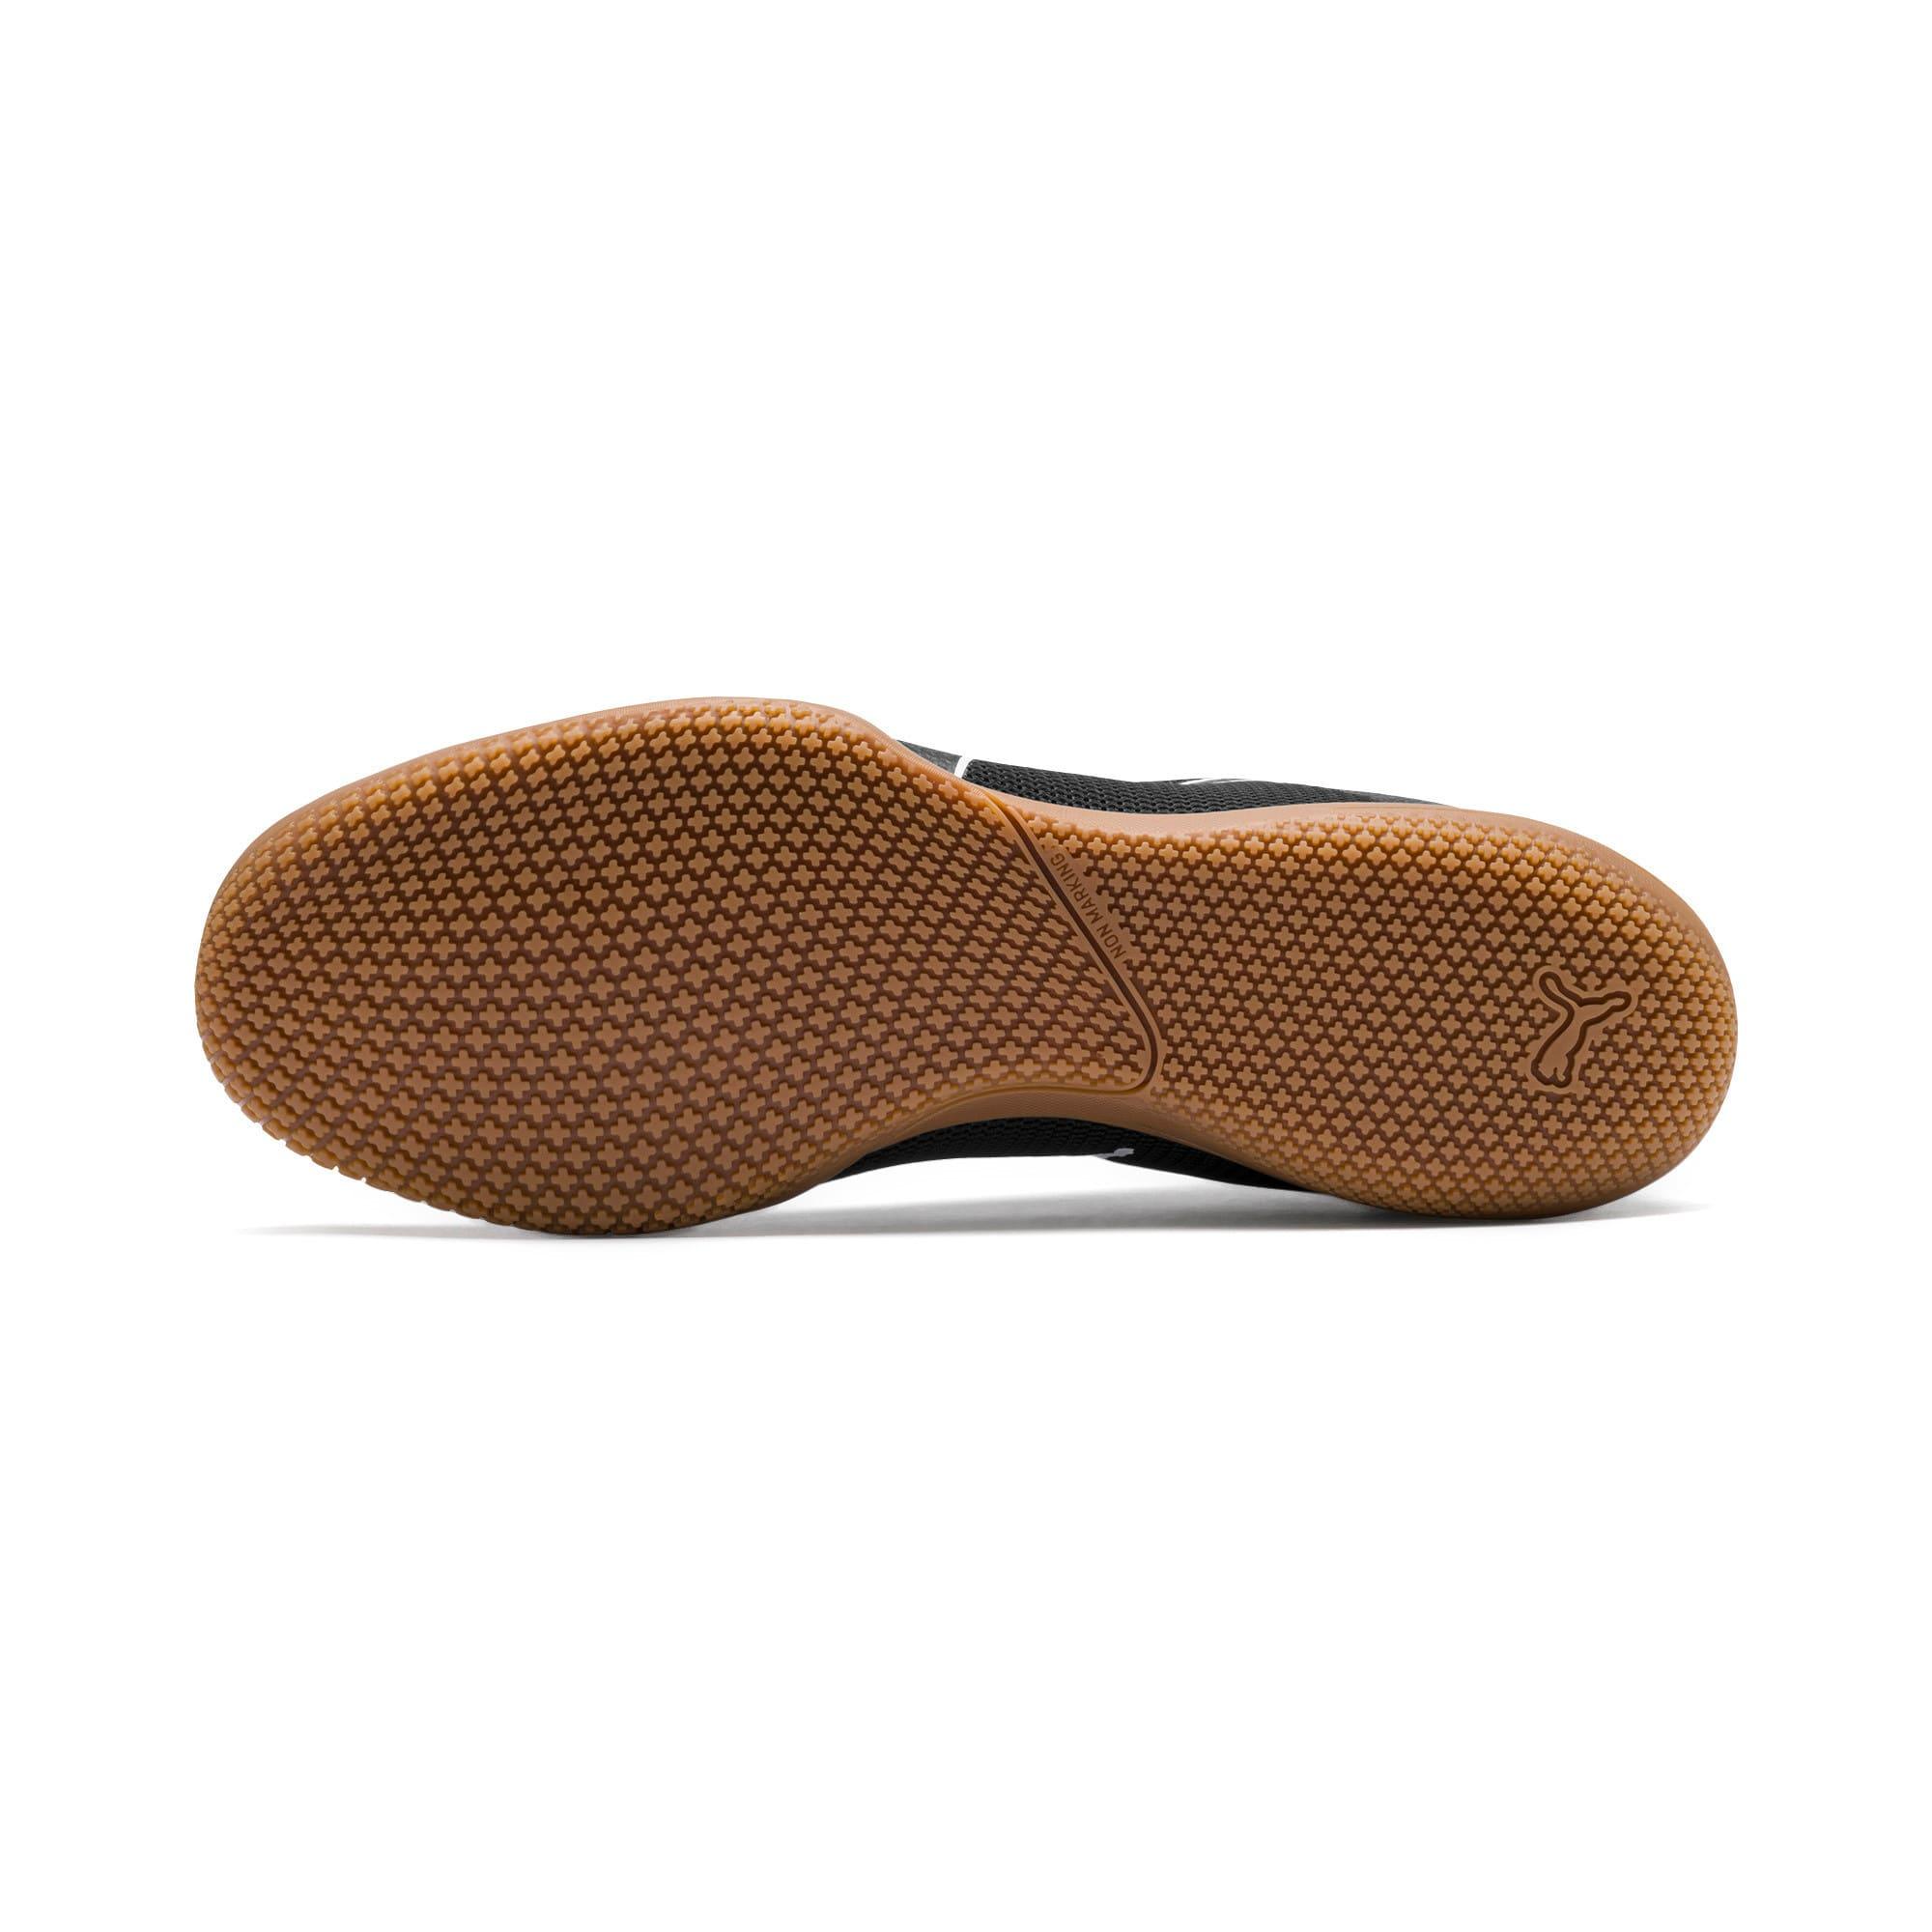 Thumbnail 5 of 365 Sala 1 Men's Soccer Shoes, Puma Black-Puma White-Gum, medium